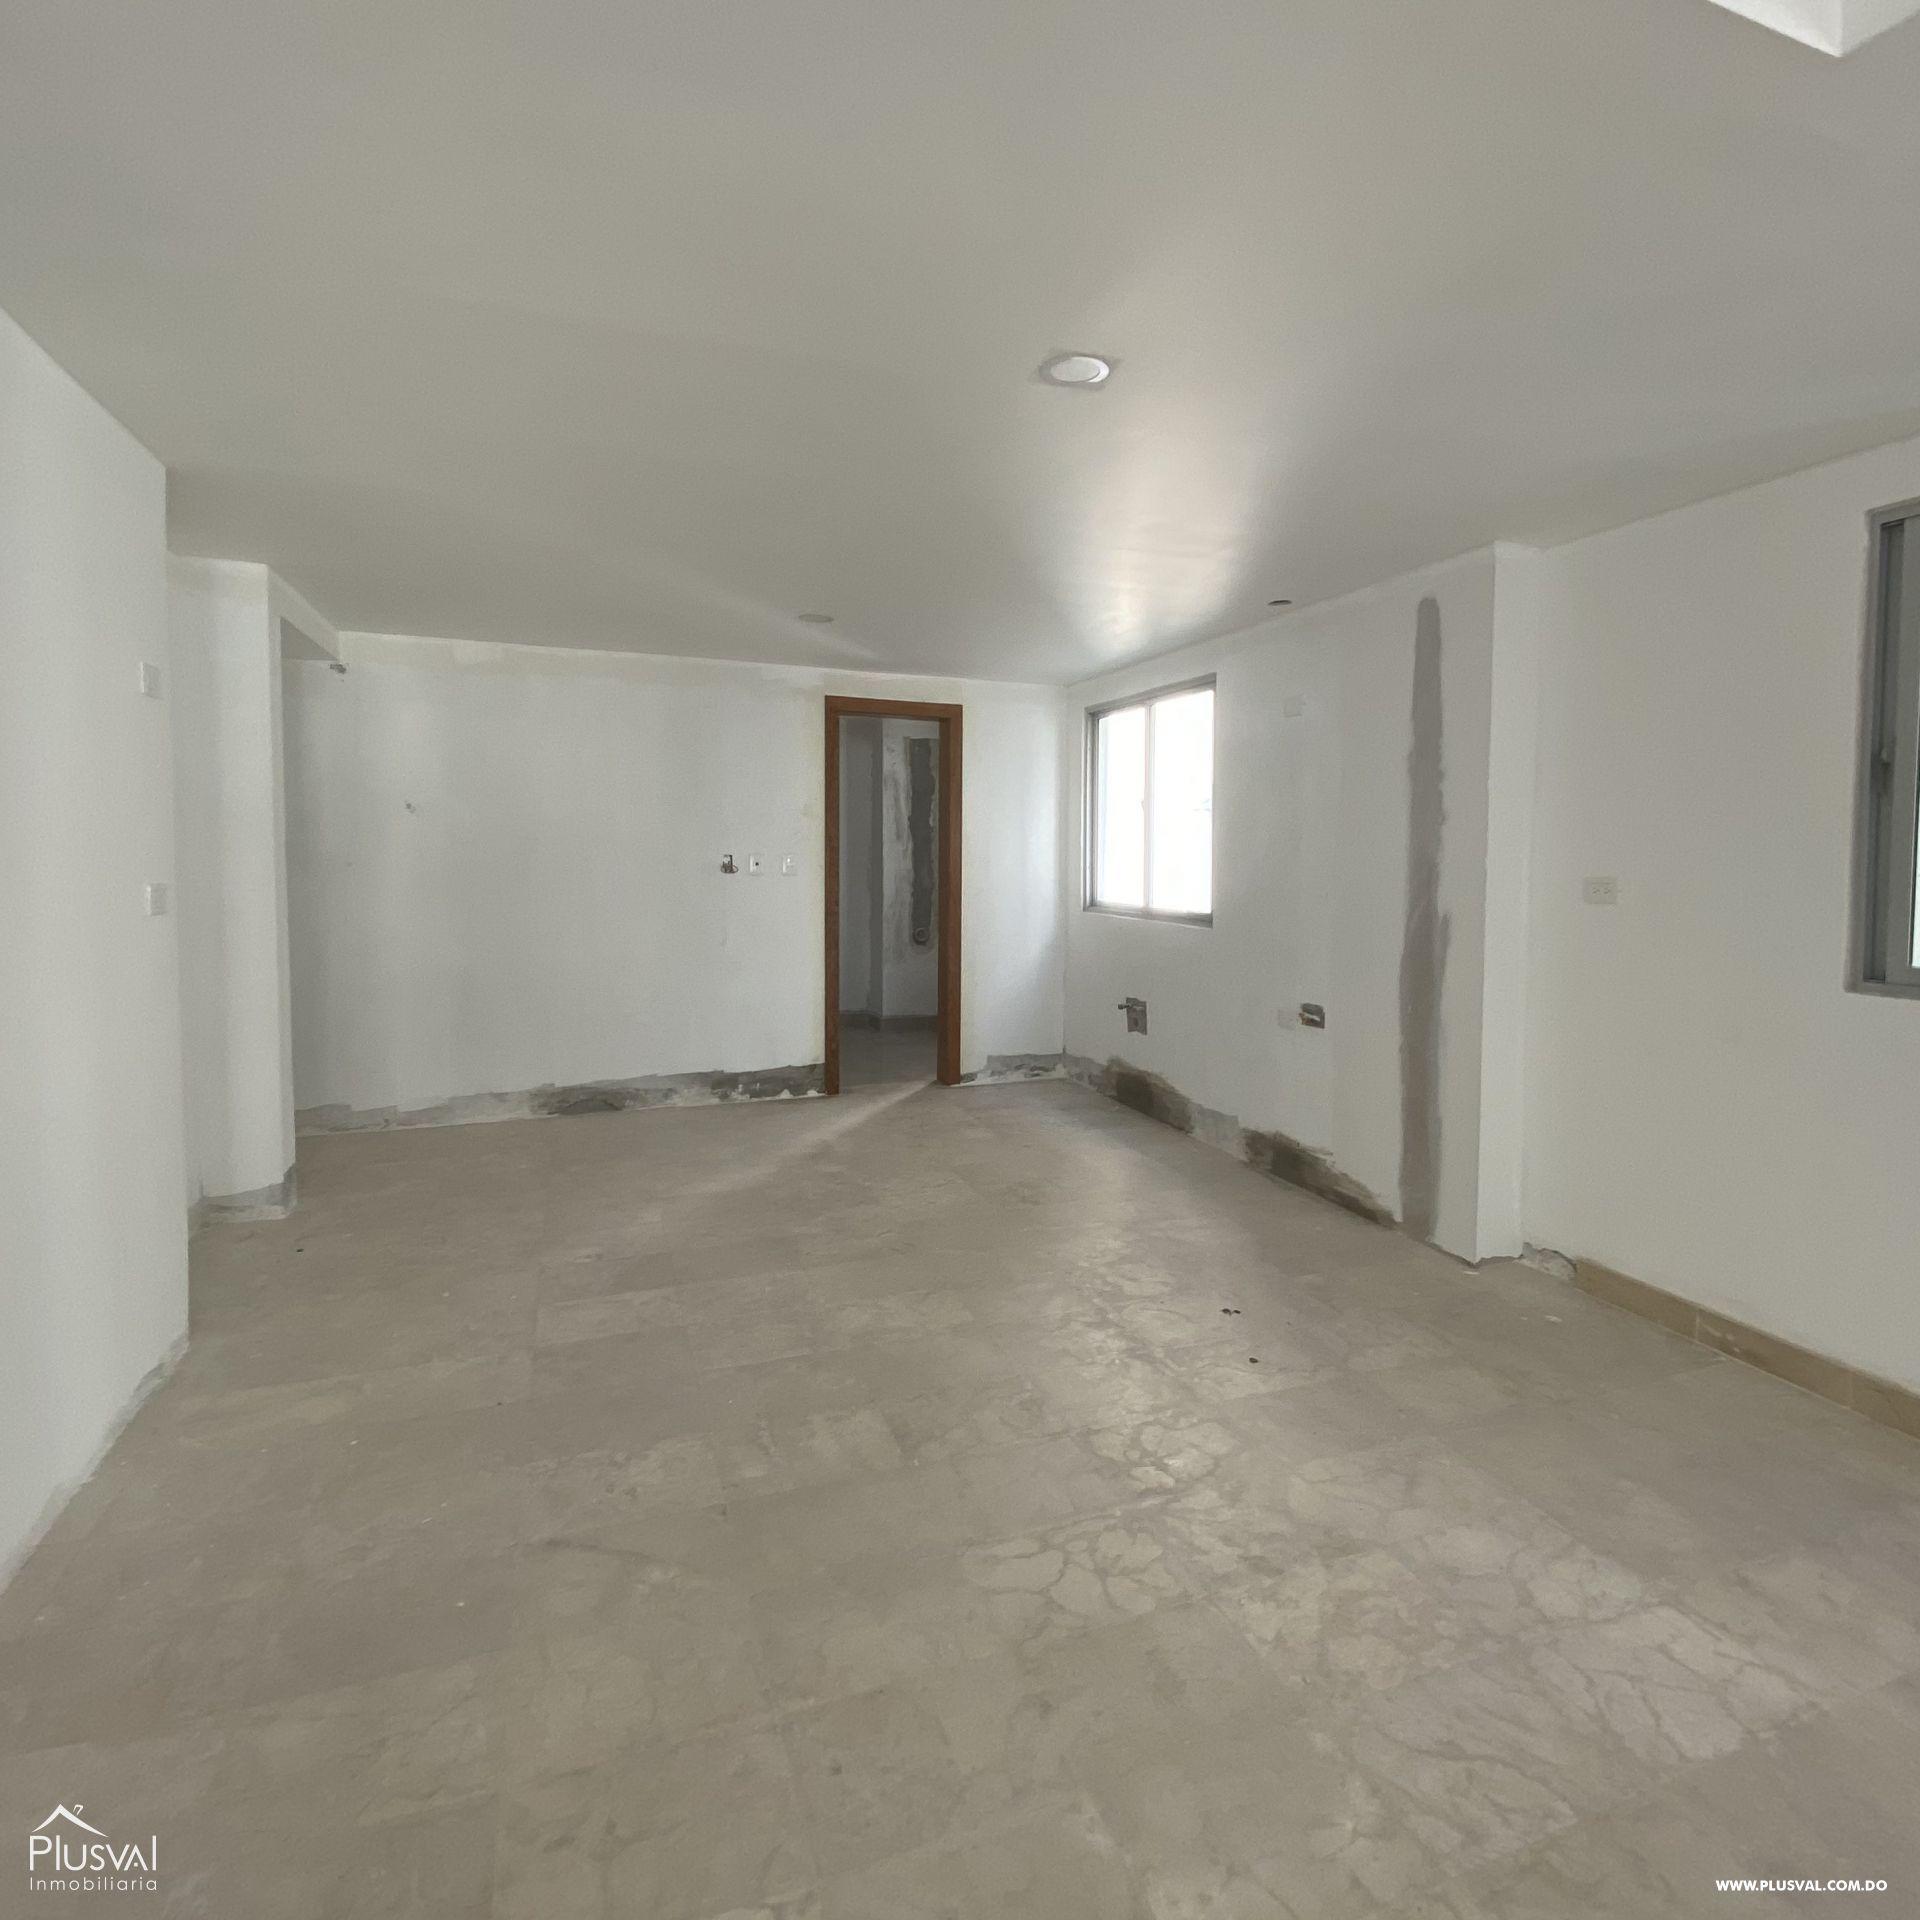 Apartamento en venta, Piantini 182258